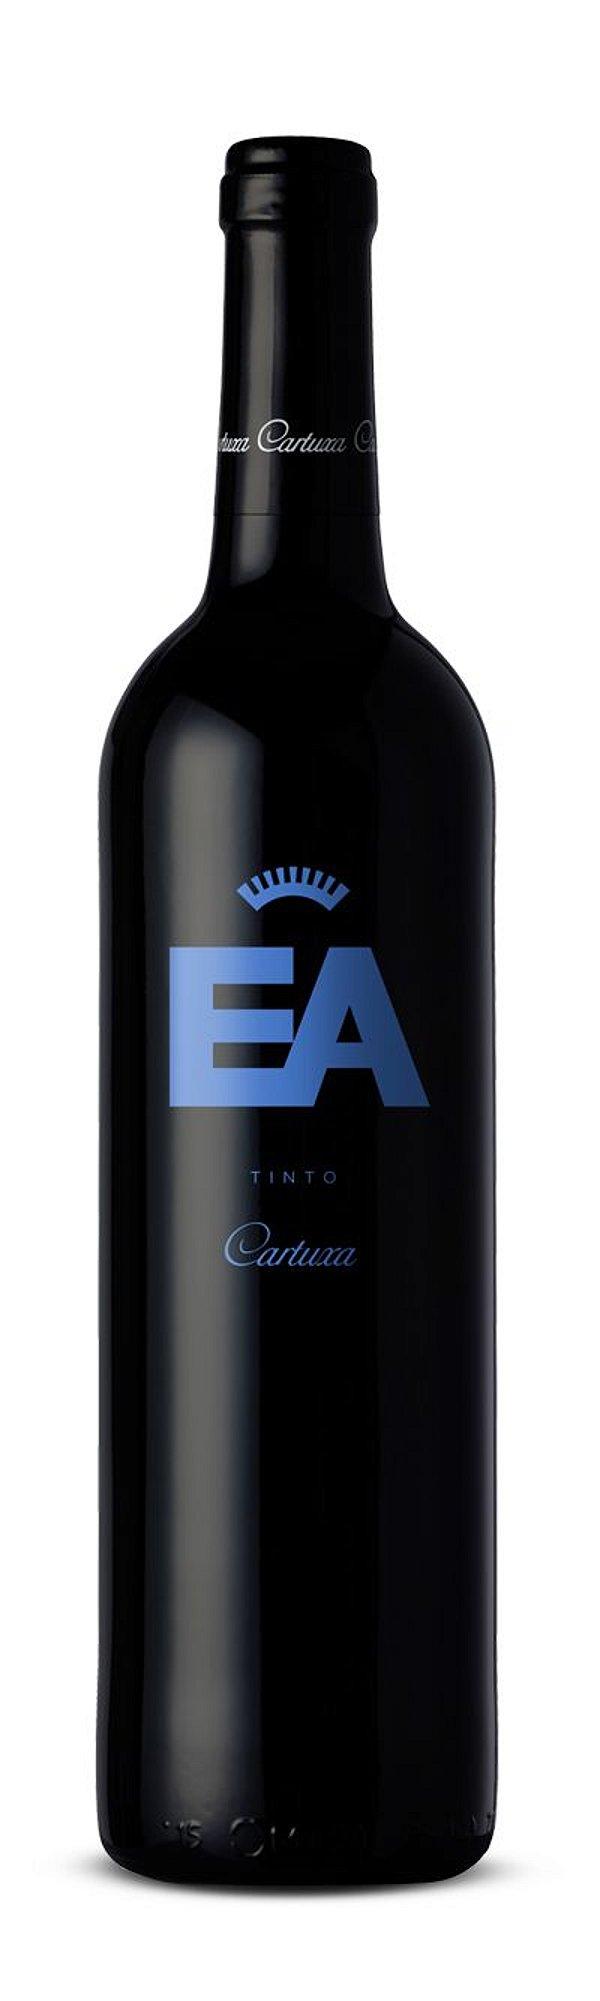 EA Cartuxa - Blend (Portugal)